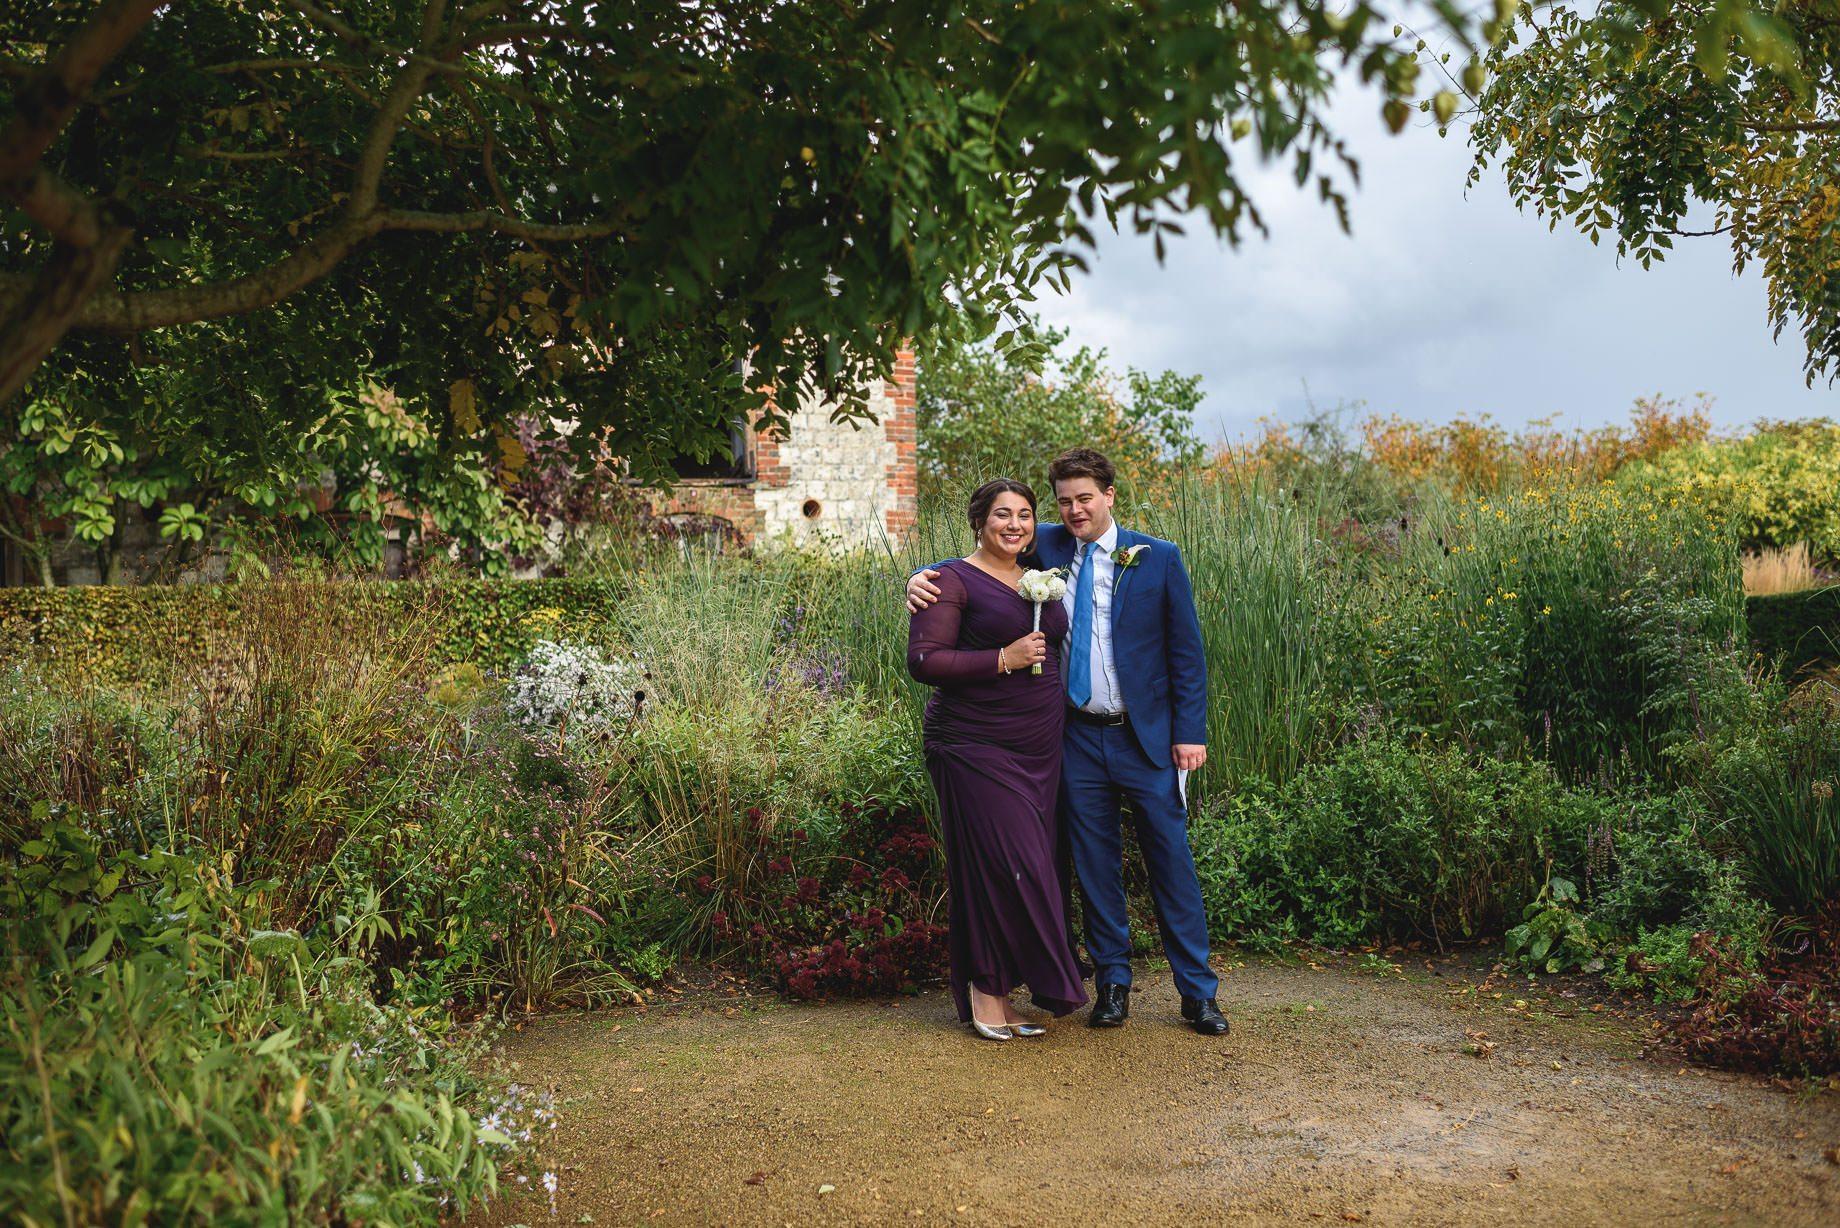 bury-court-barn-wedding-photography-guy-collier-photography-nadia-tom-96-of-184